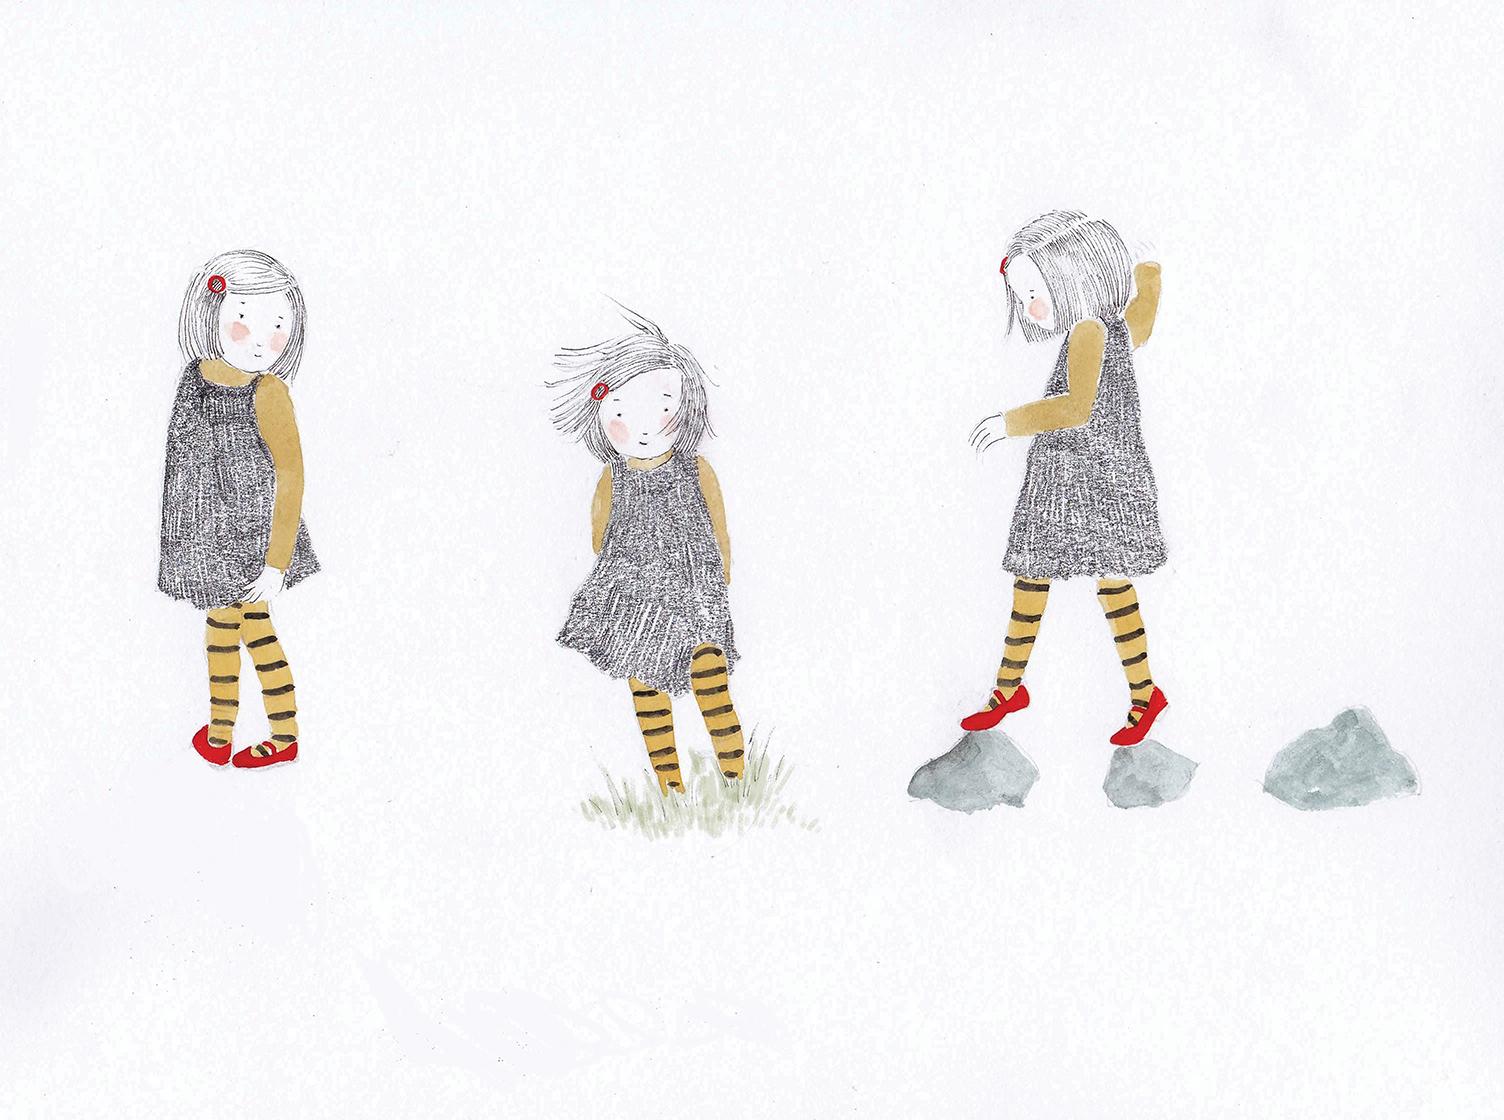 vignettes of Bea pencil dress rgb.jpg